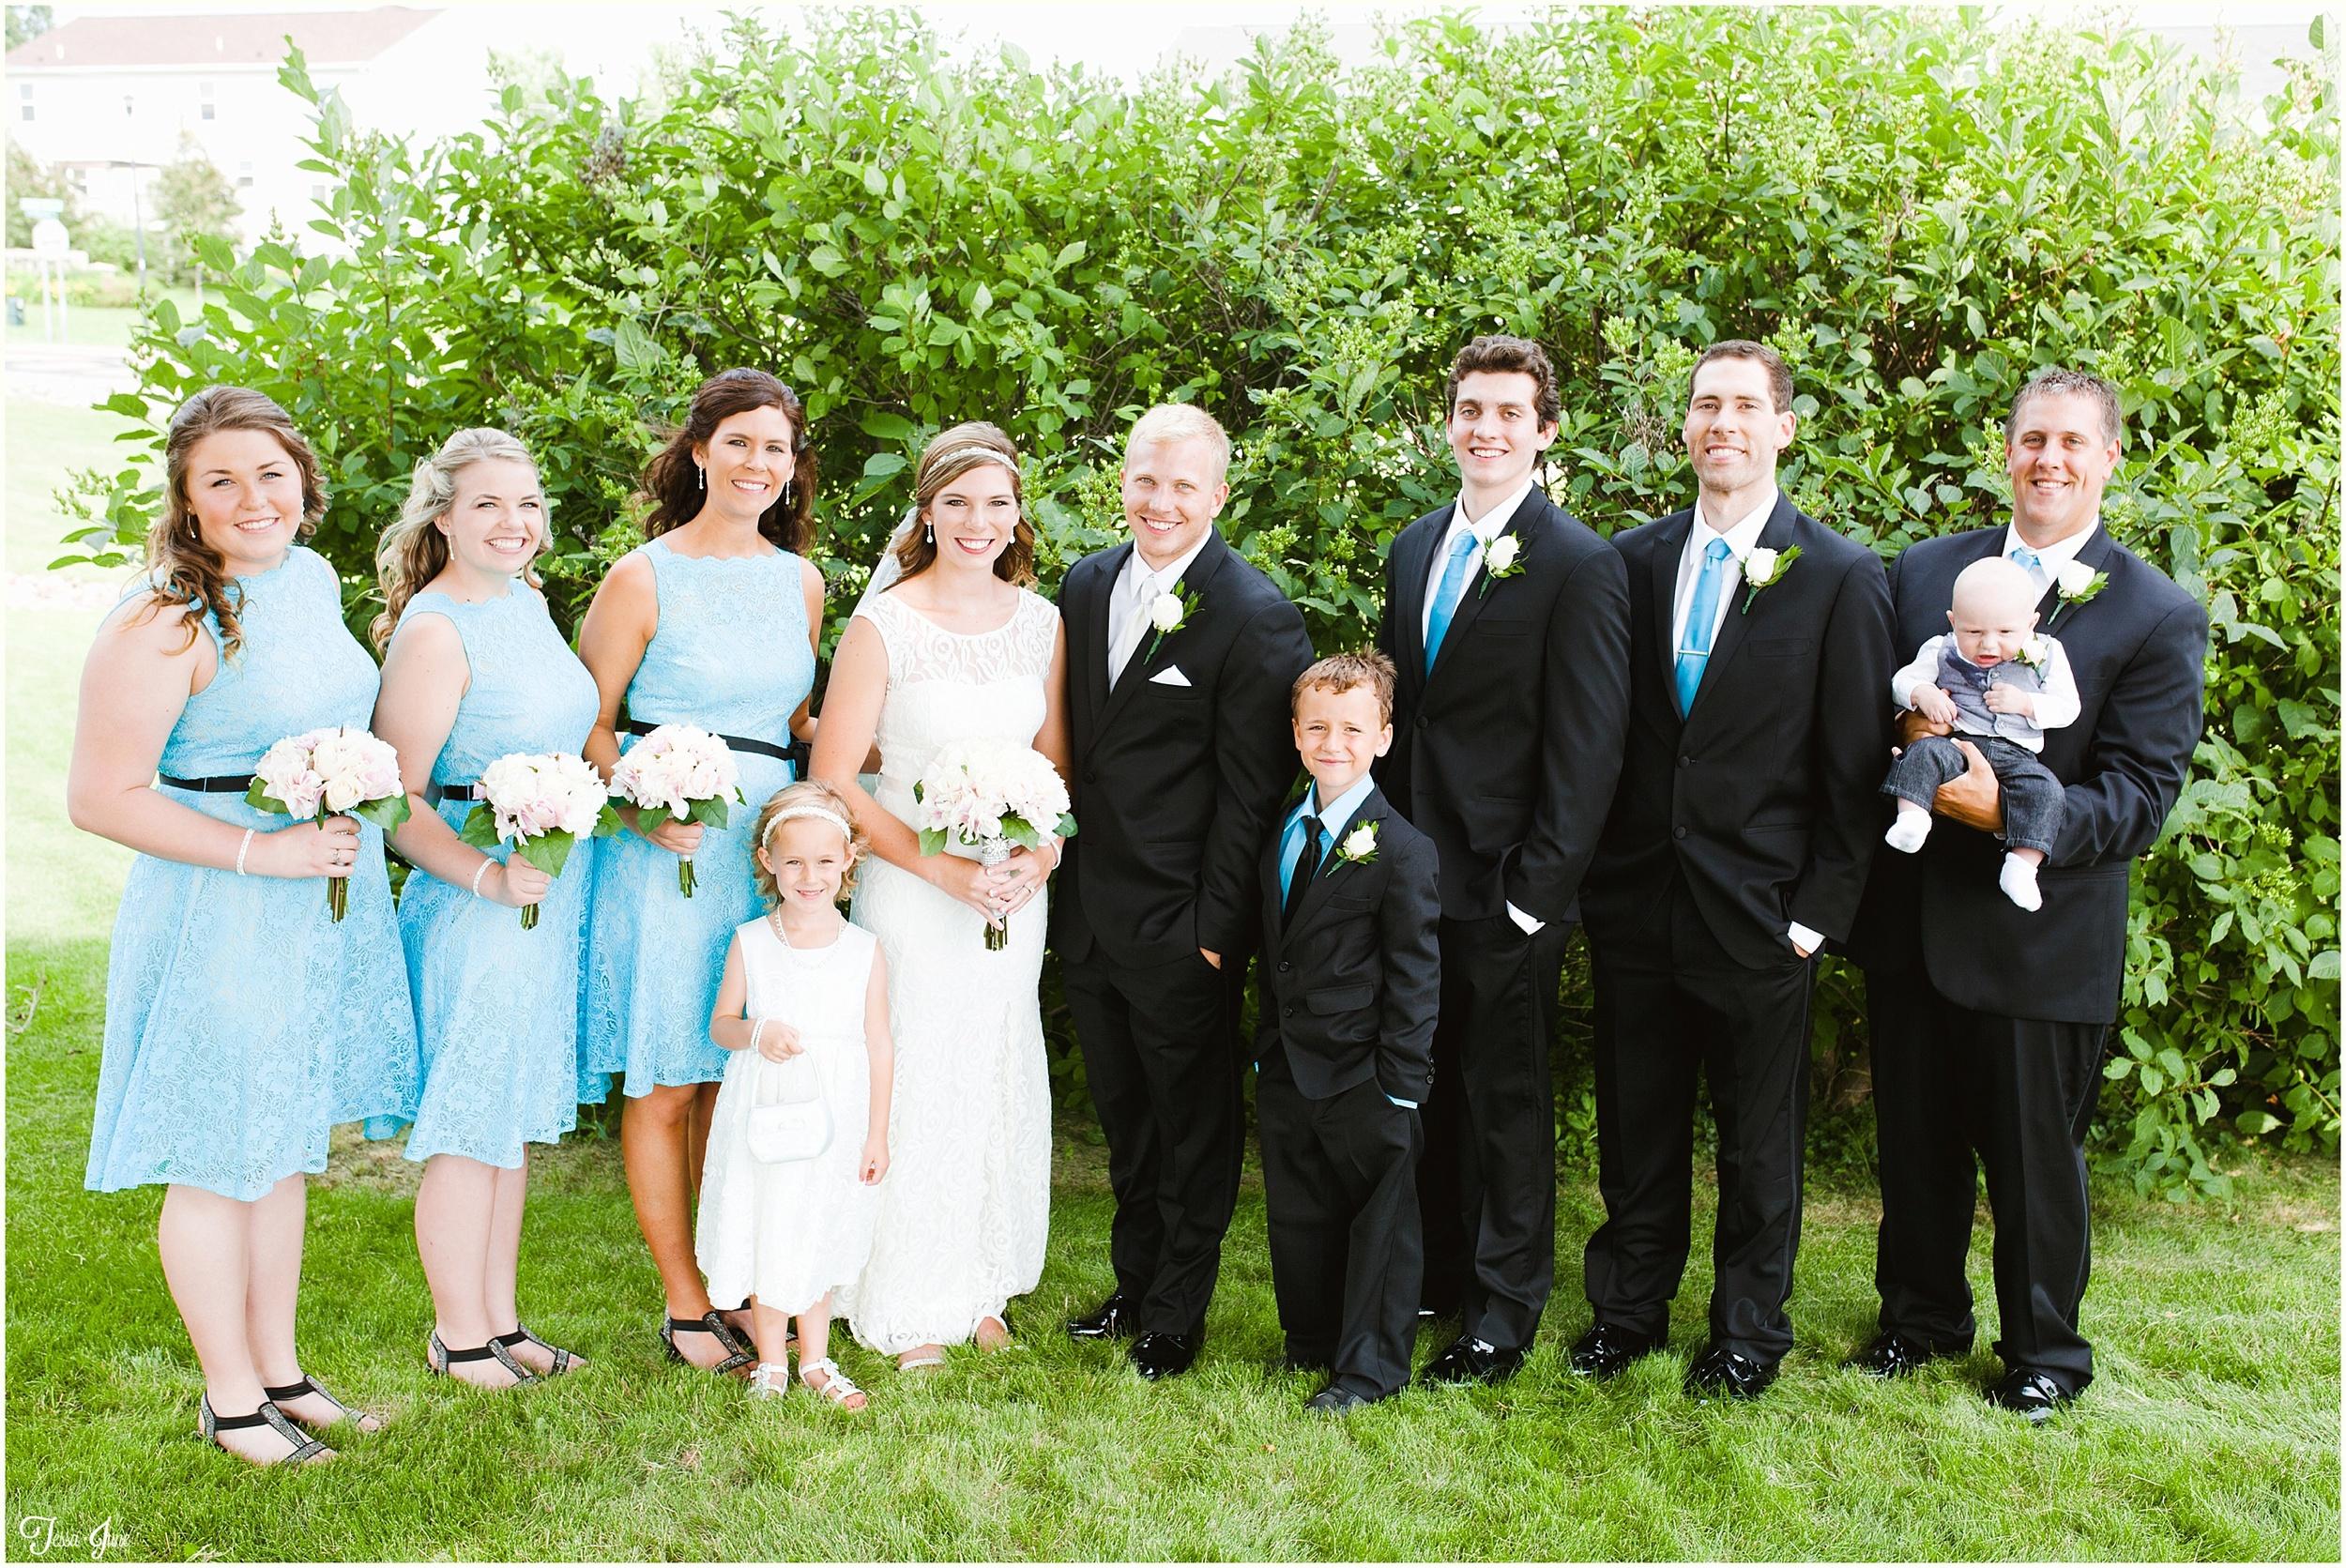 Island-View-Golf-Course-Waconia-Minnesota-Wedding